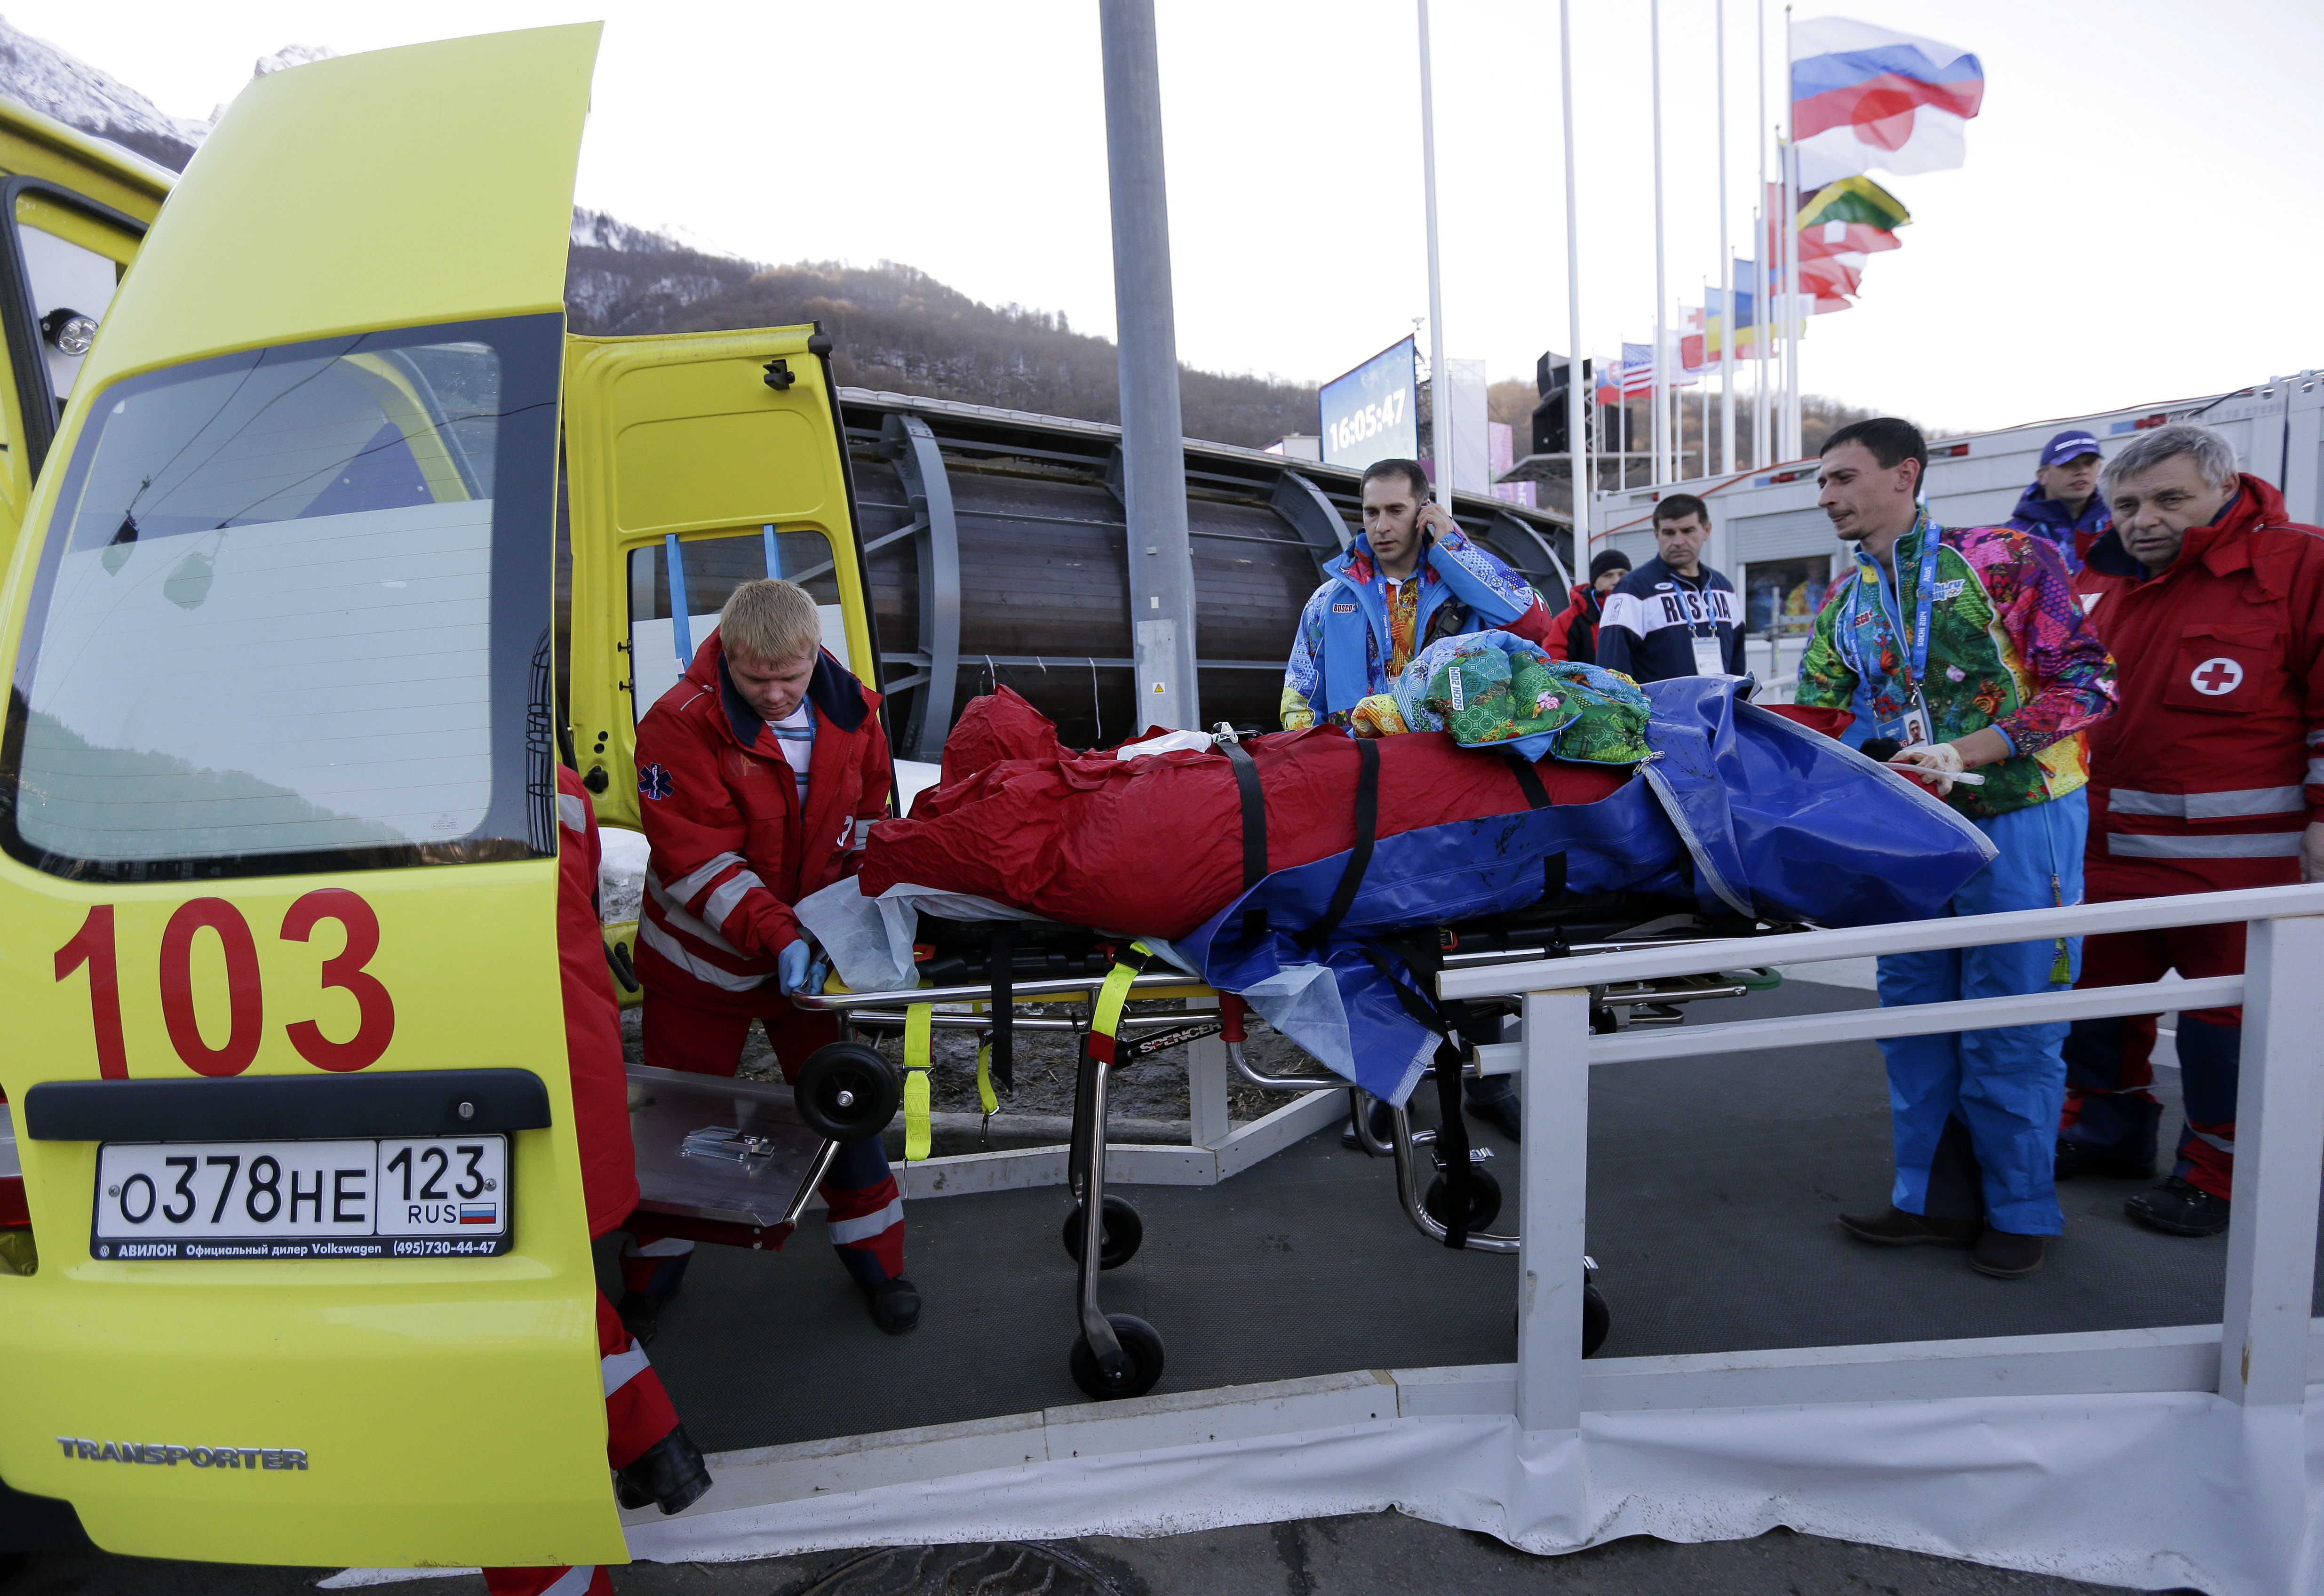 травмы сочи олимпиада